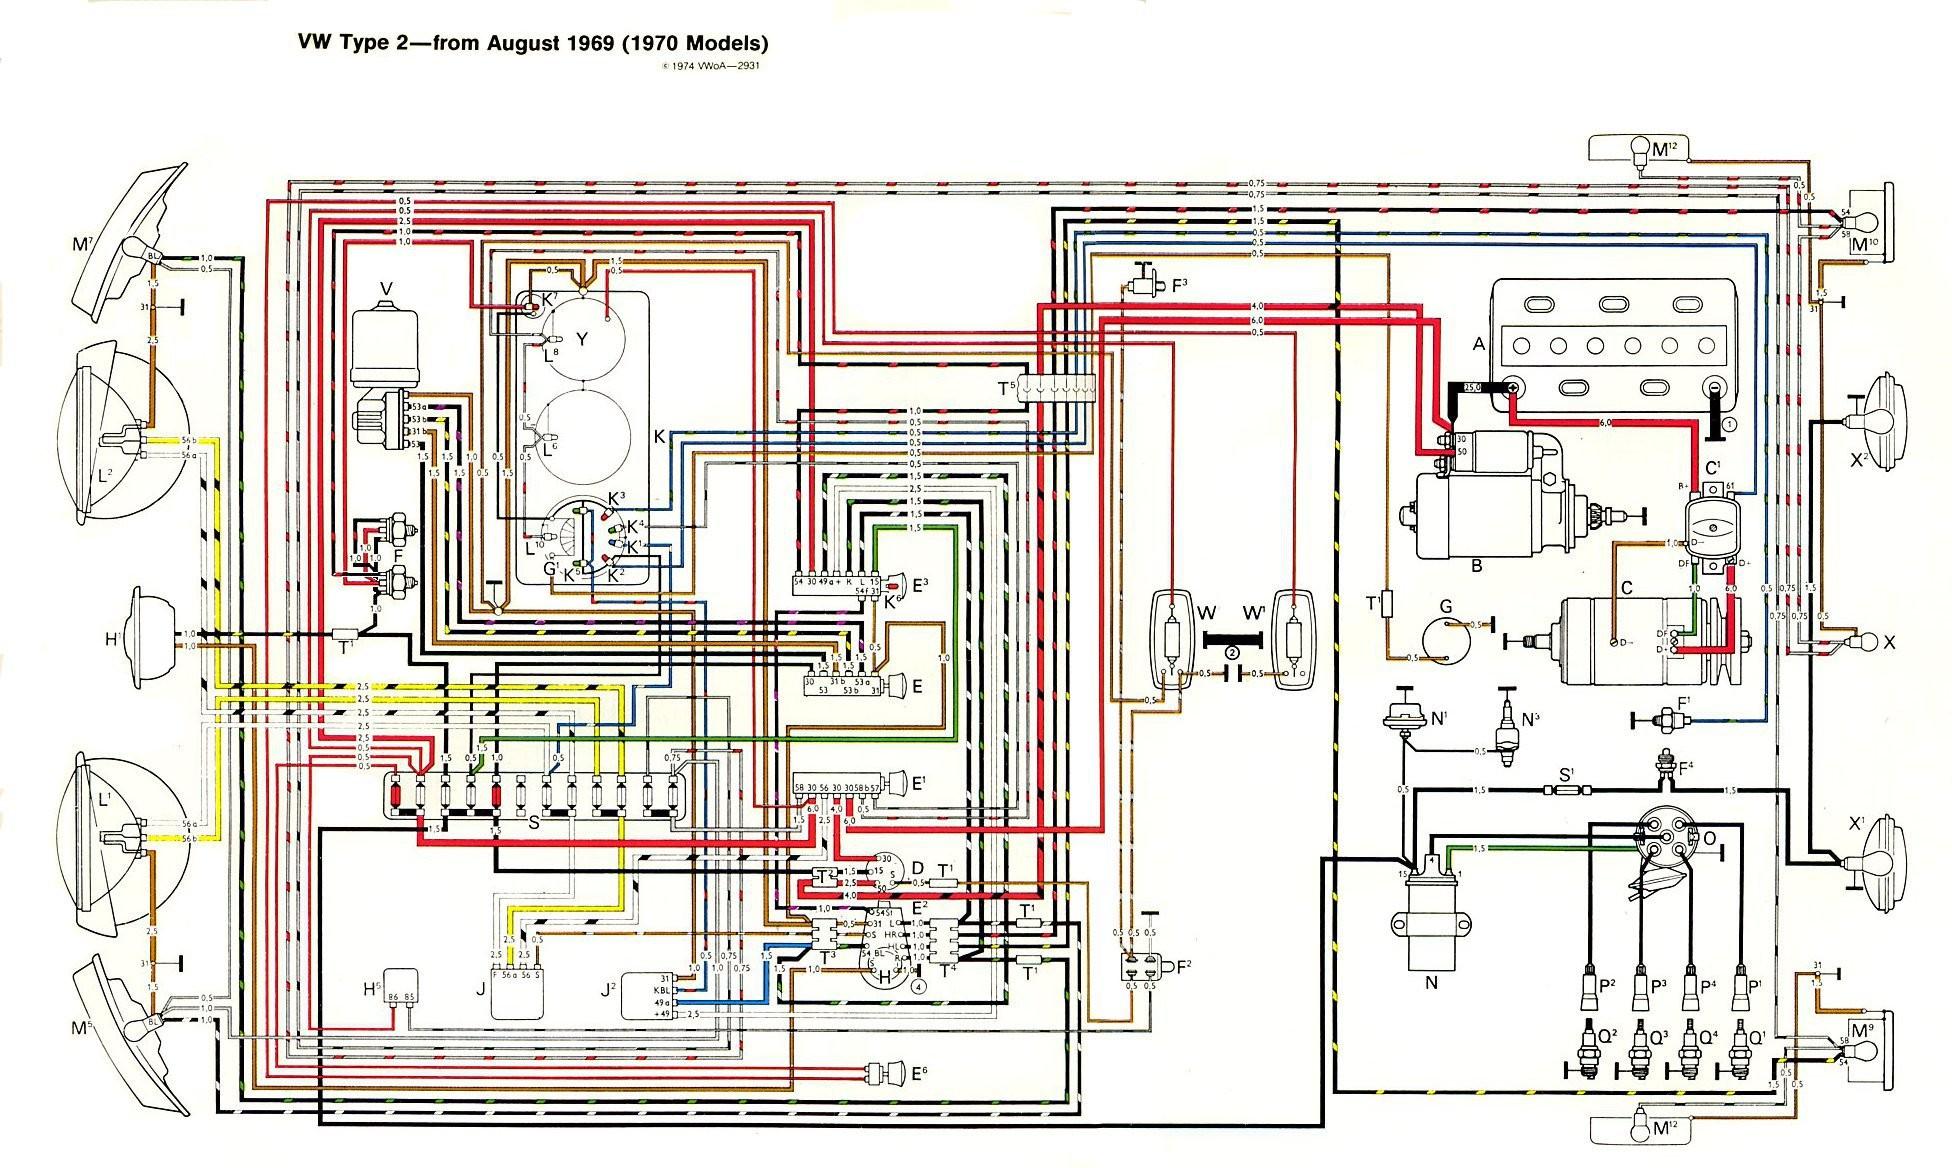 vw type 1 engine diagram thesamba type 2 wiring diagrams of vw type 1 engine diagram type 1 vw engine wiring great installation of wiring diagram \u2022